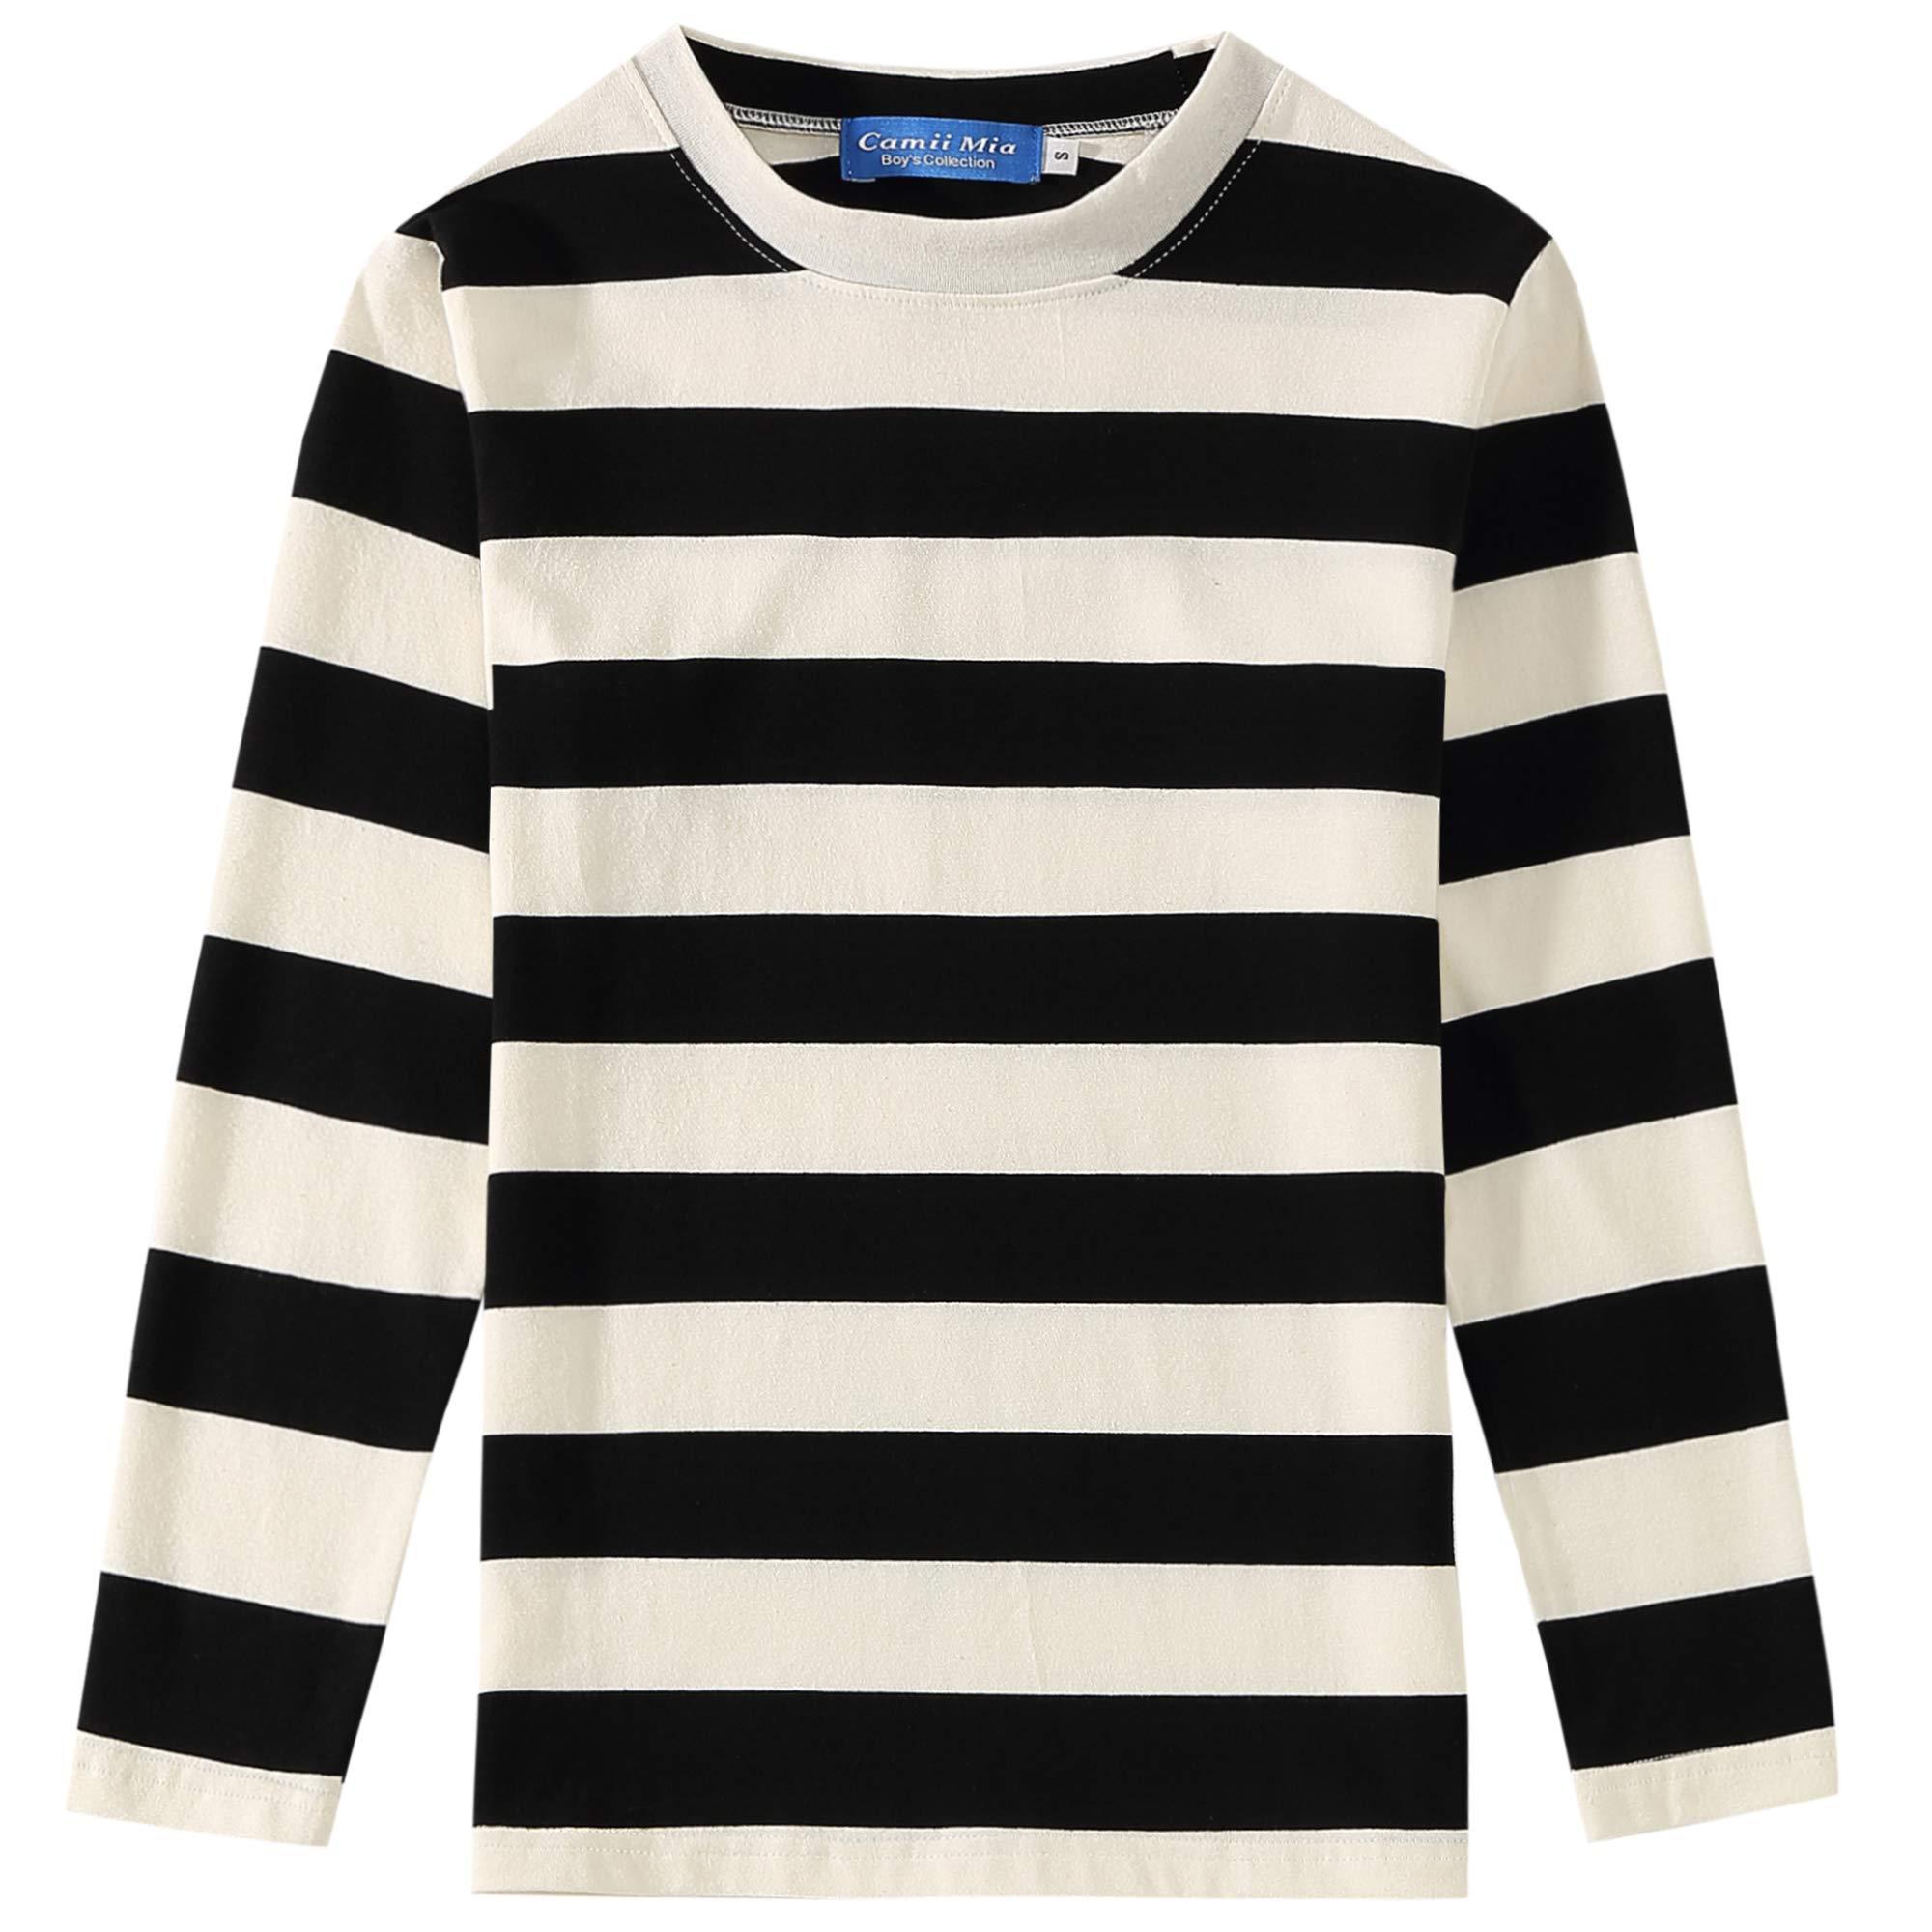 SSLR Big Boys' Cotton Crew Neck Casual Long Sleeves Stripe T-Shirt